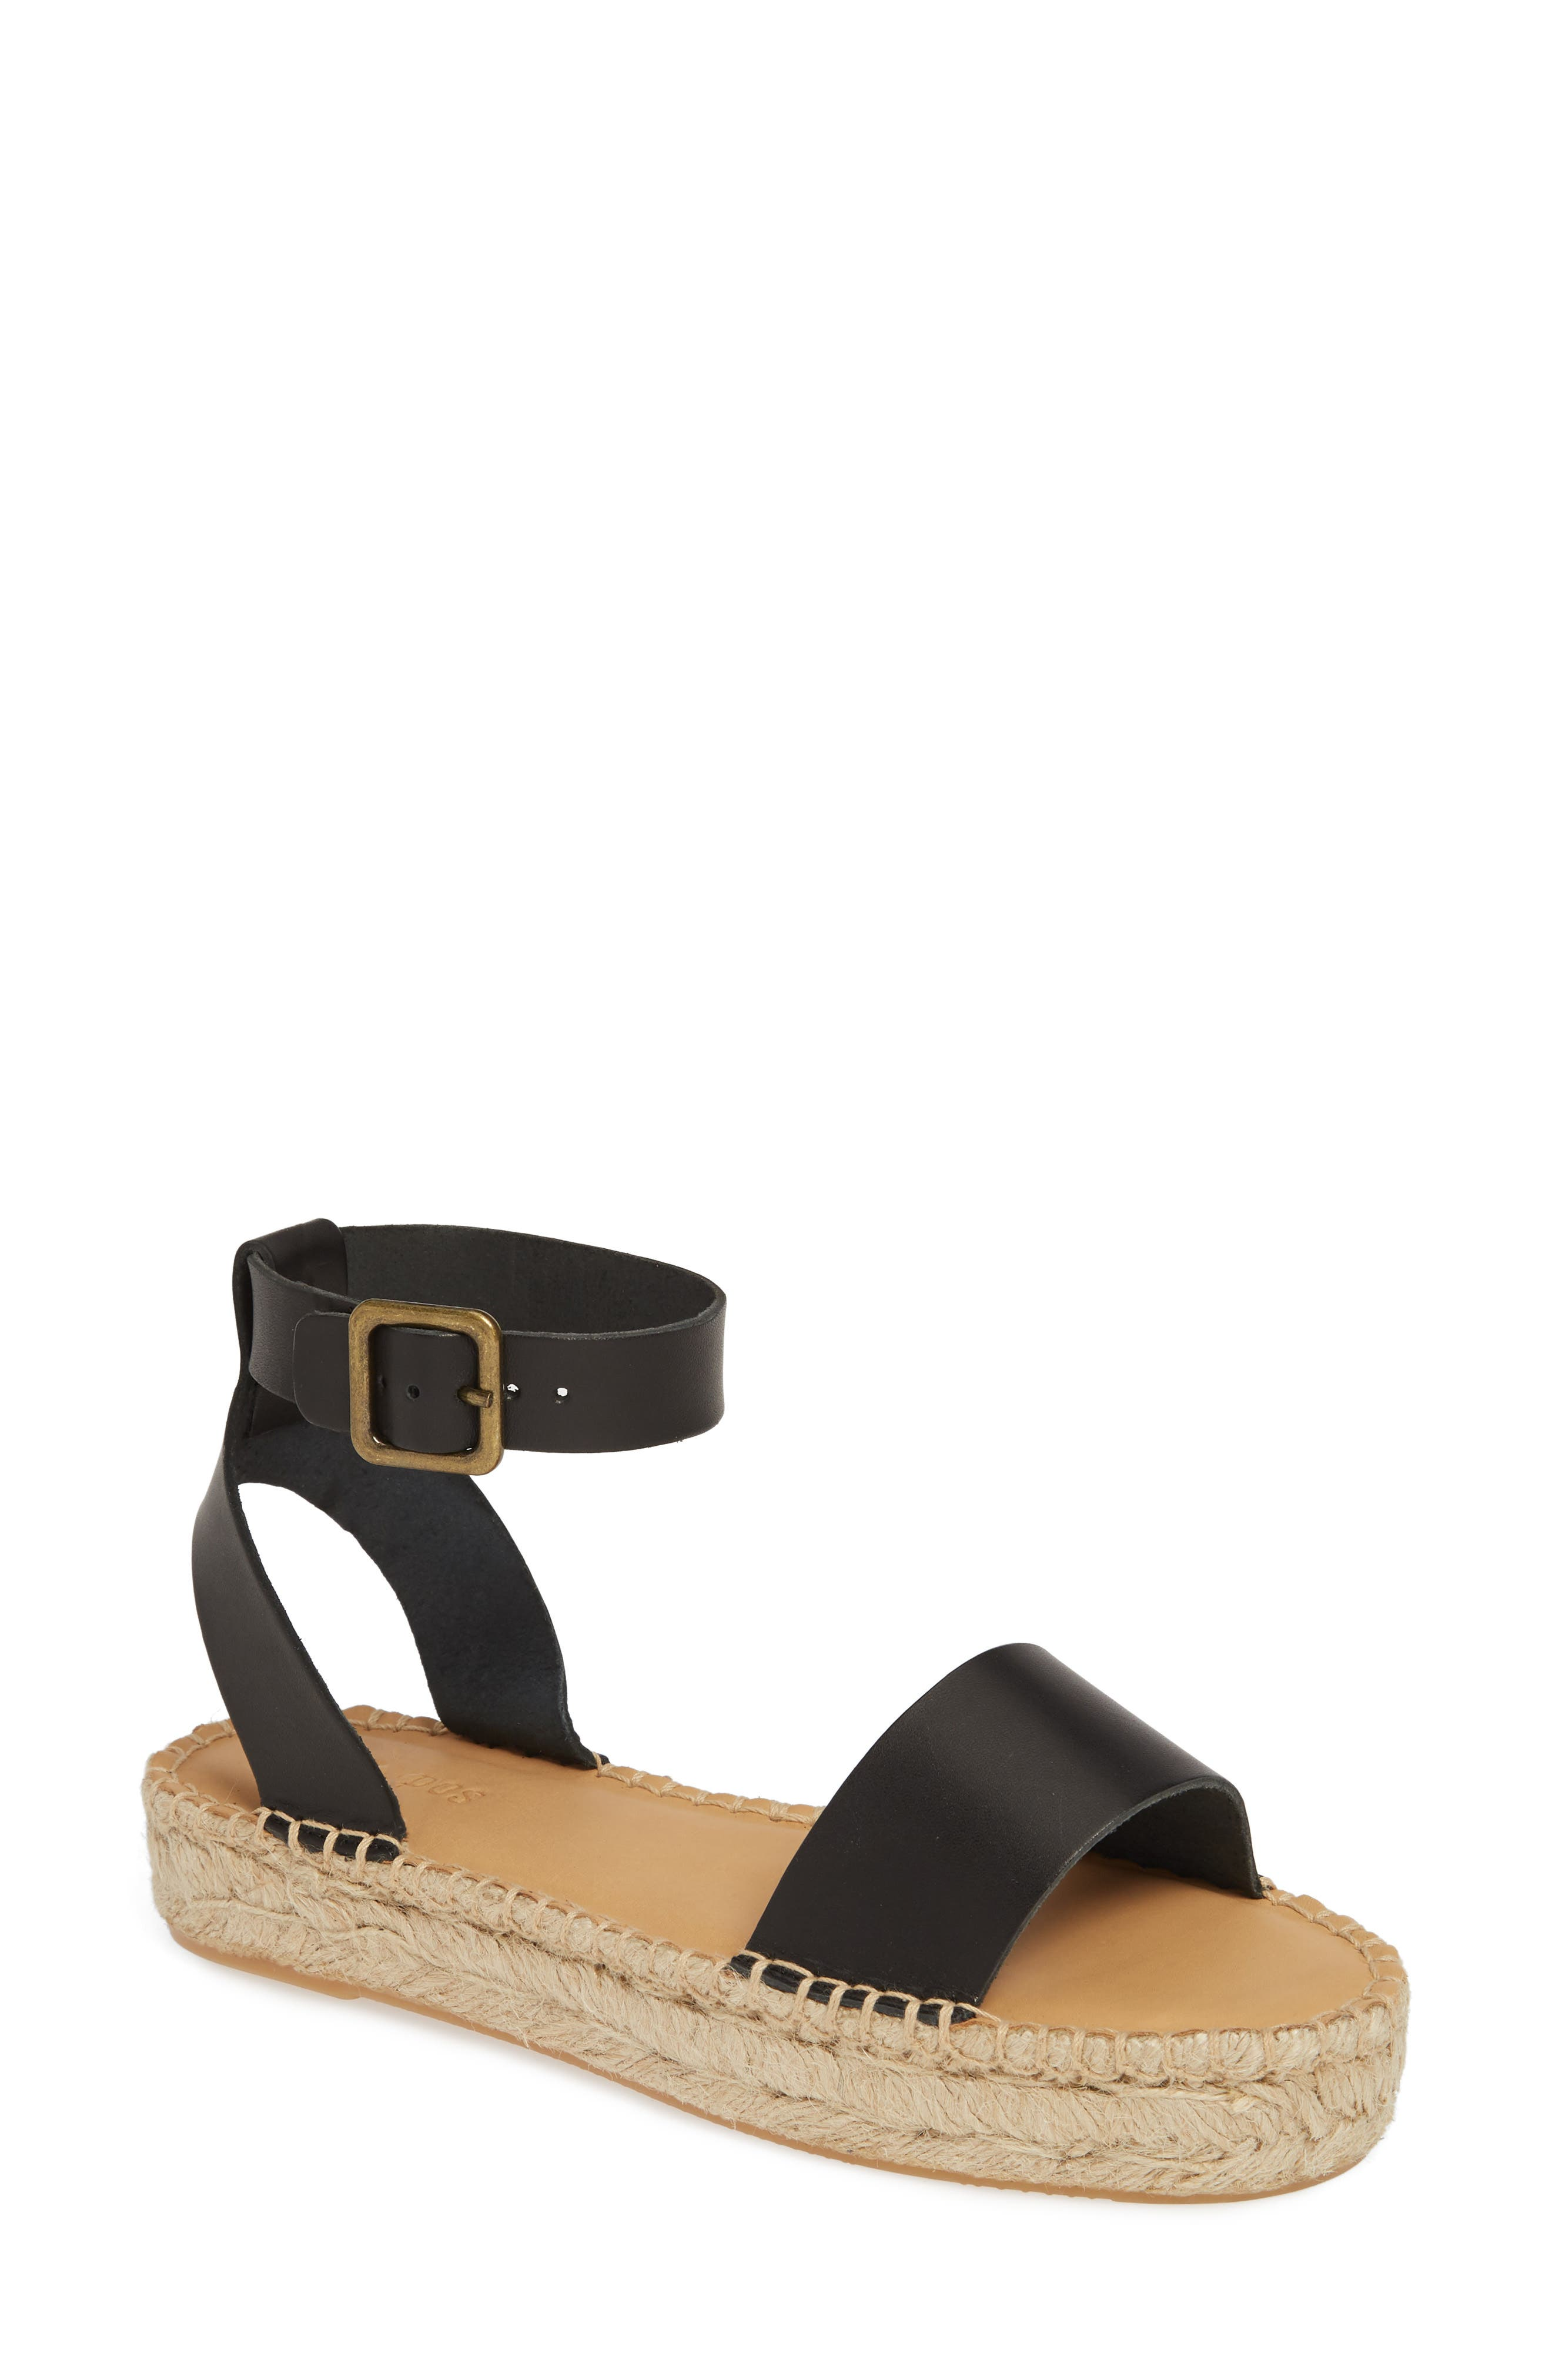 SOLUDOS Cadiz Espadrille Sandal, Main, color, BLACK